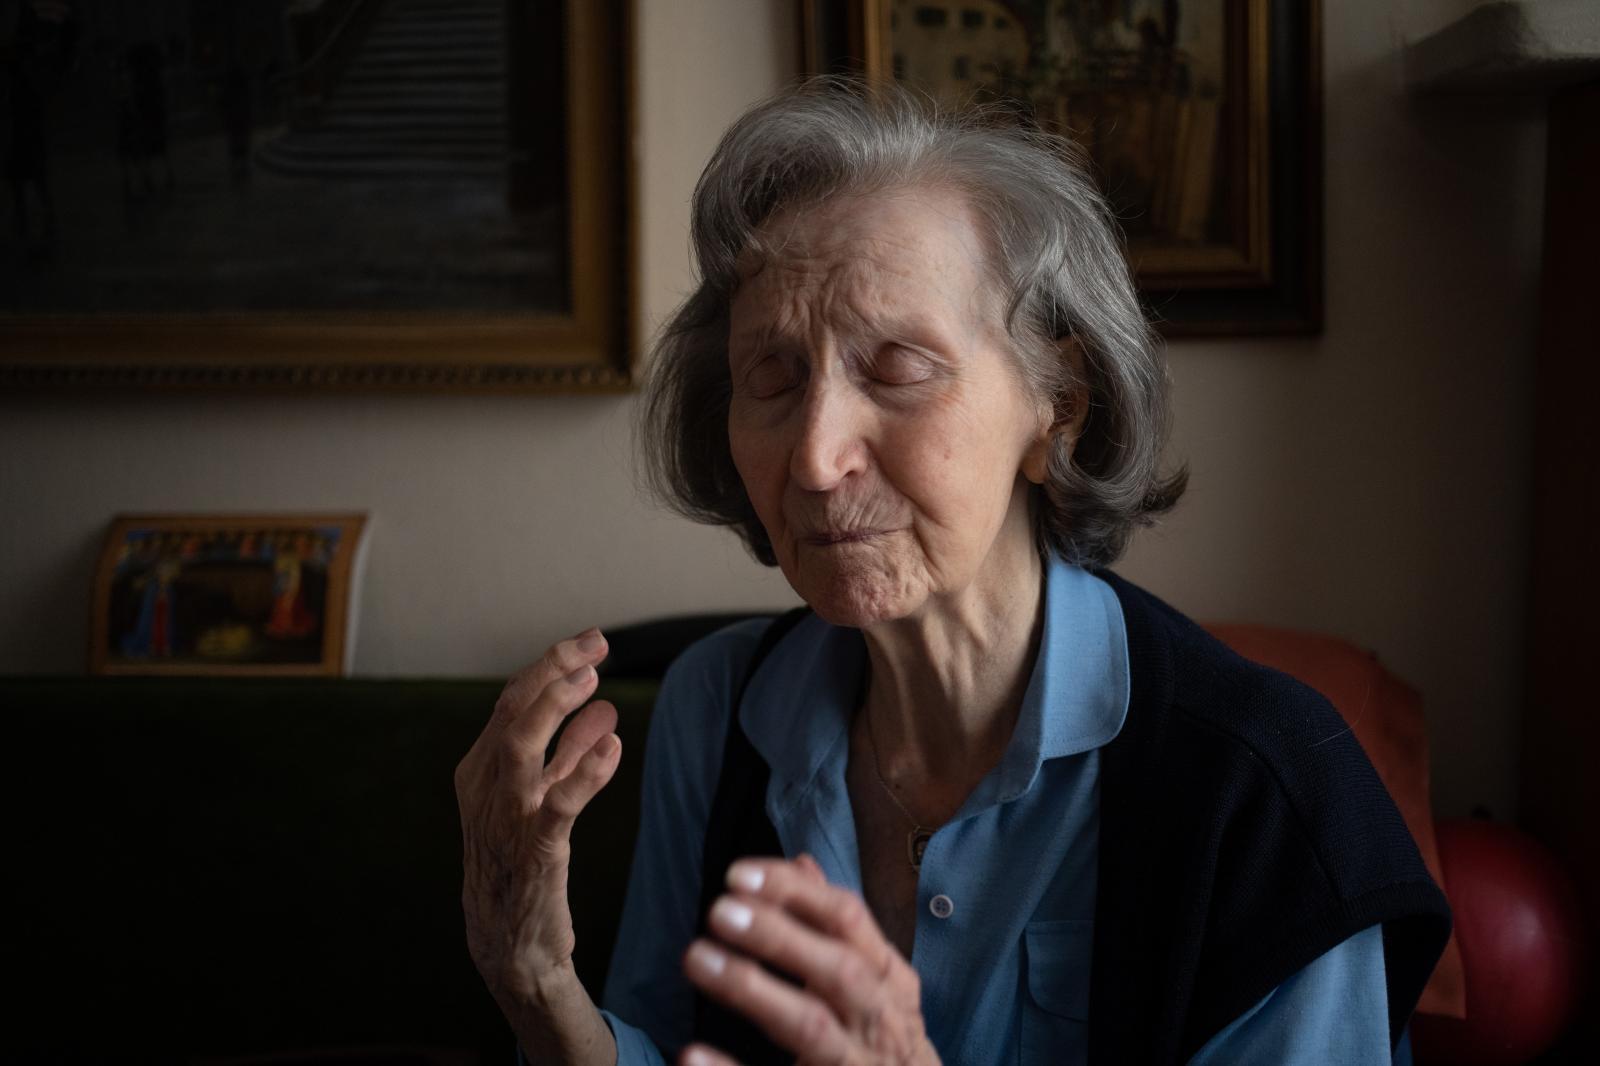 WARSAW, POLAND, 13/01/2020: Zofia Posmysz, 96 years old Auschwitz concentration camp survivor, at her home in Warsaw. (Photo by Piotr Malecki)